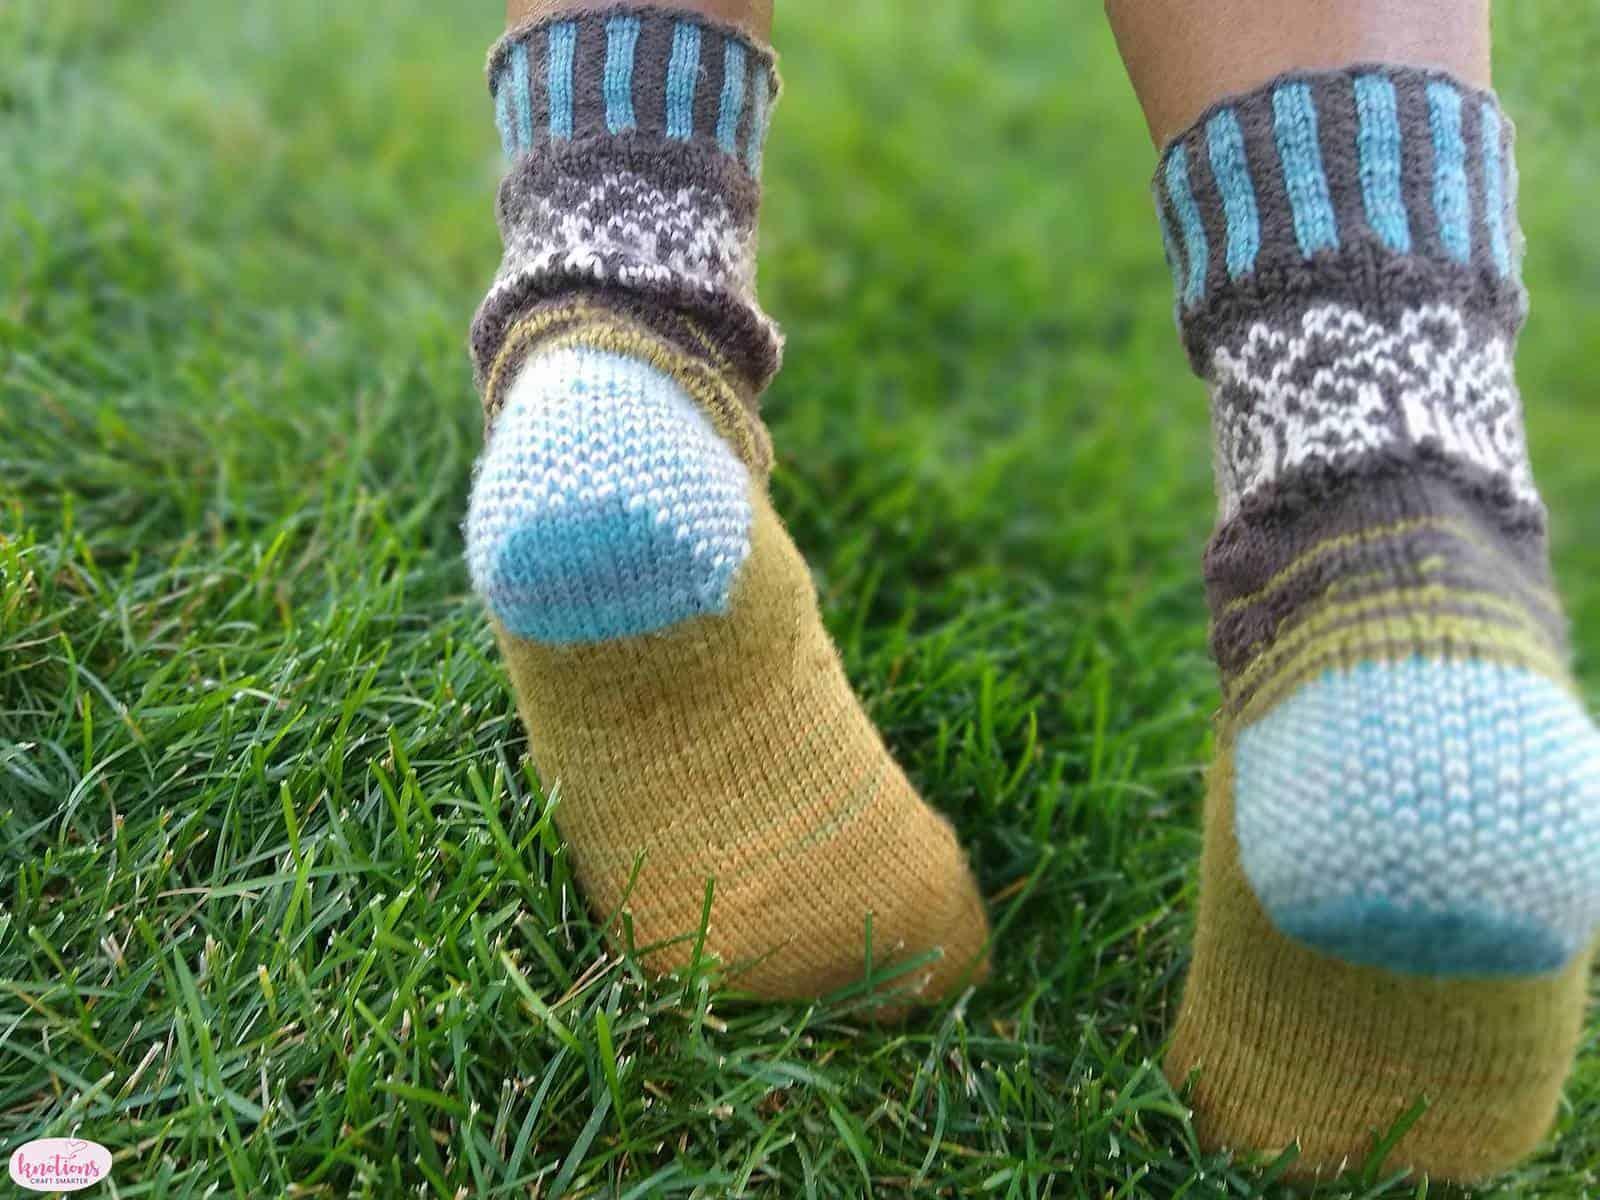 carved-wood-socks-8